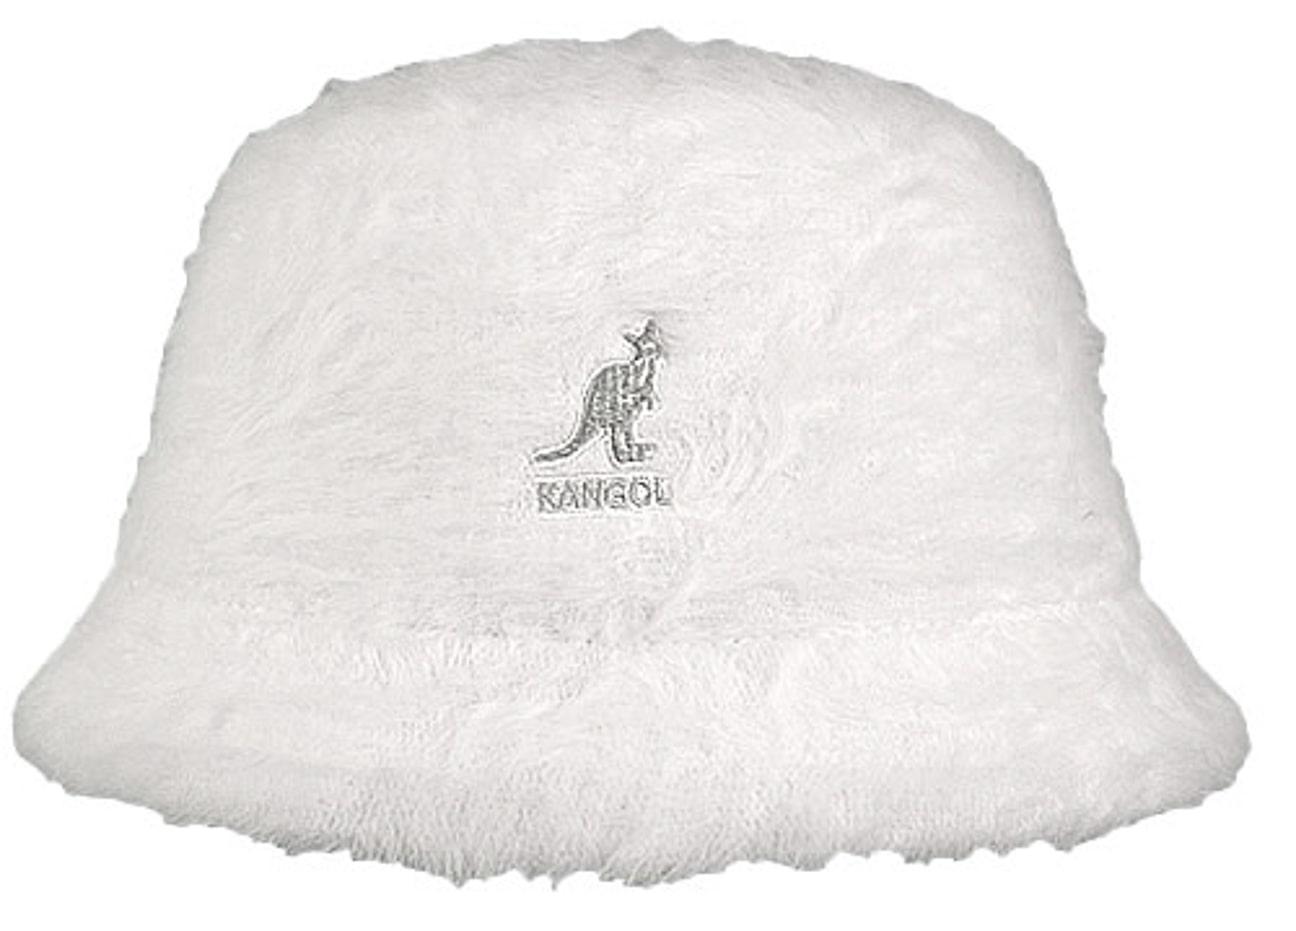 Kangol Furgora Bin Hat - white 1 ... aa08a7d1acf